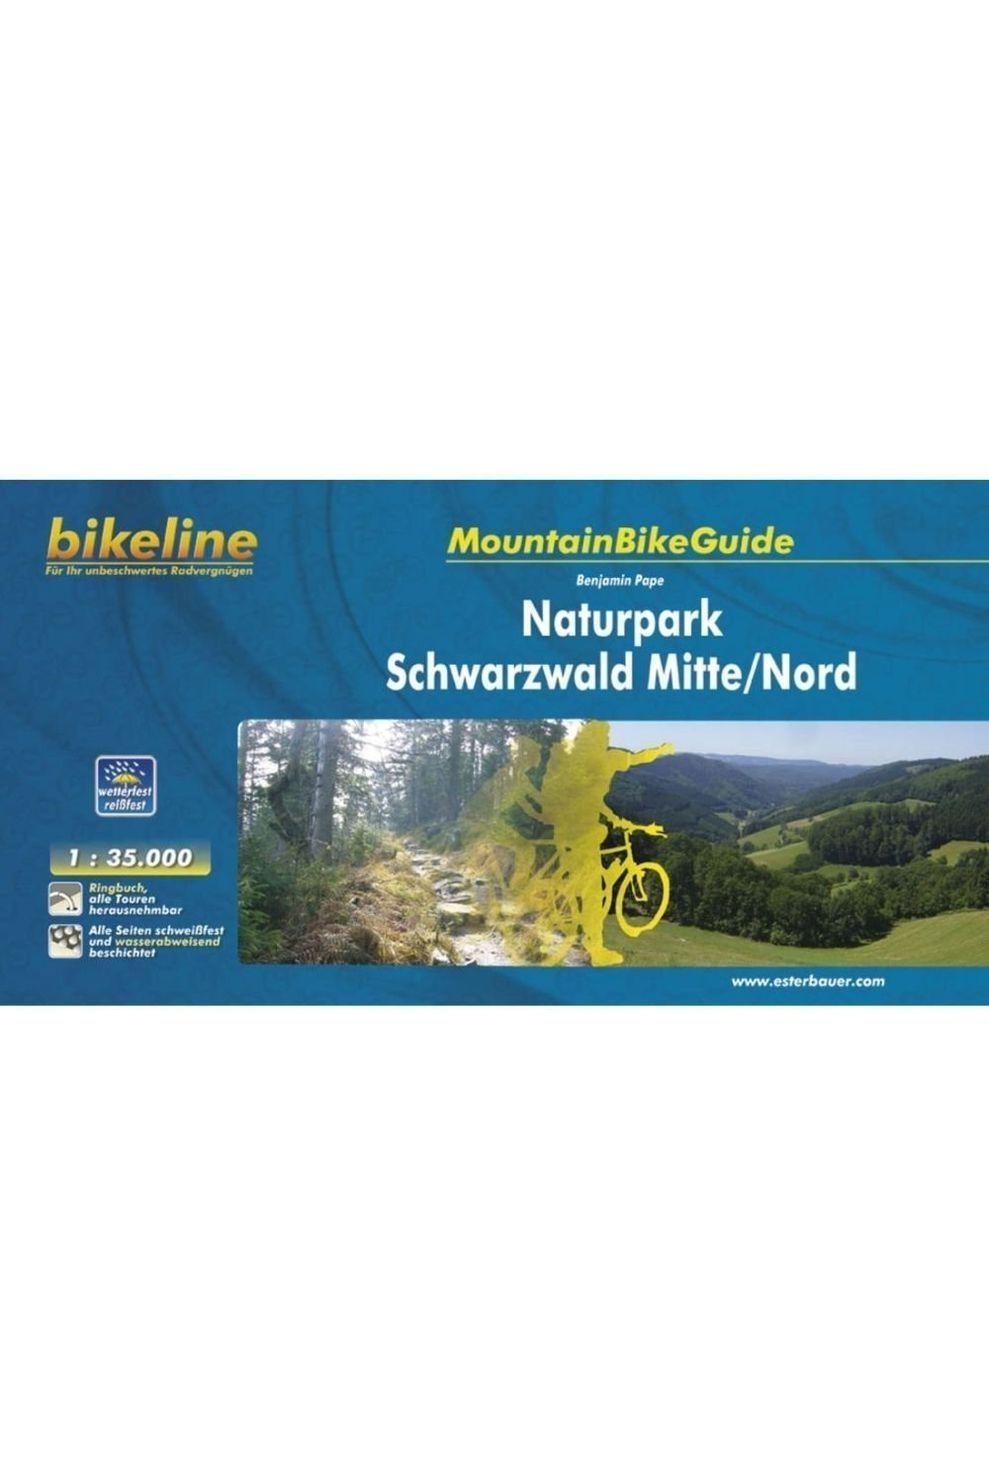 Bikeline Schwarzwald Mitte/nord Naturpark Mountainbikeguide Gps